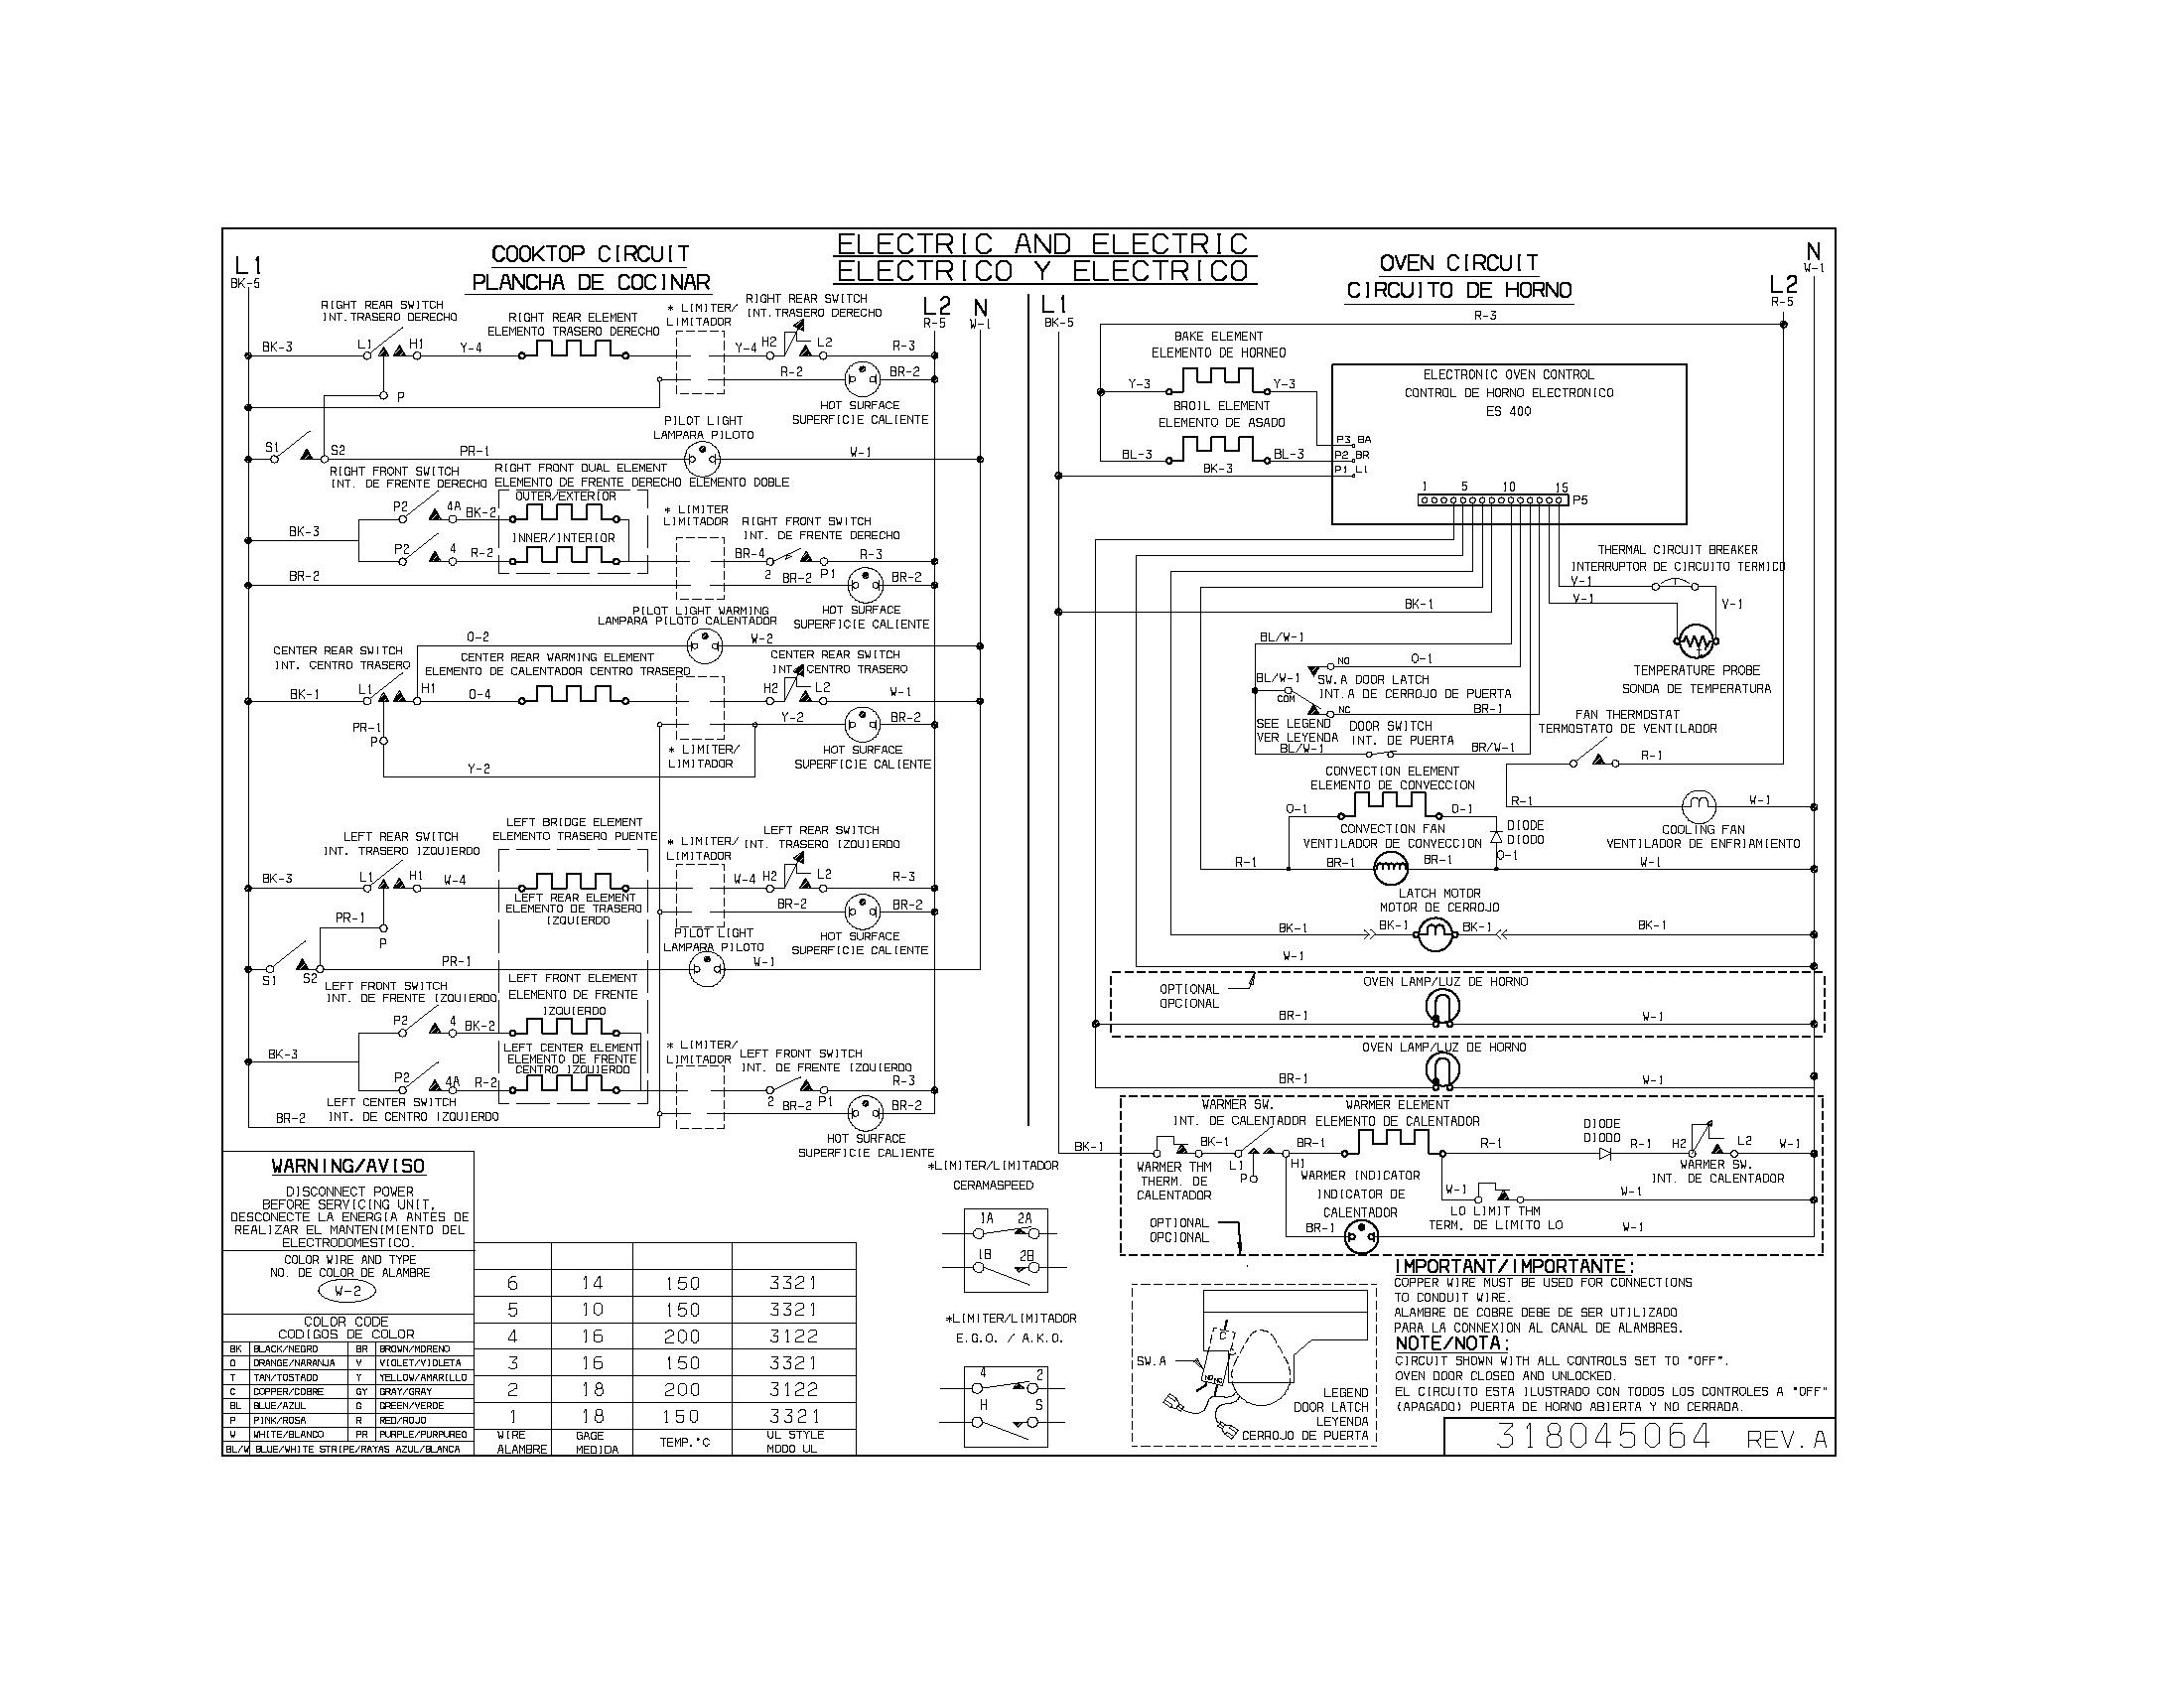 wiring diagram parts?resize\\\\\\\=665%2C514\\\\\\\&ssl\\\\\\\=1 kgra806pss wiring diagram household wiring diagrams \u2022 edmiracle co Basic Electrical Wiring Diagrams at soozxer.org